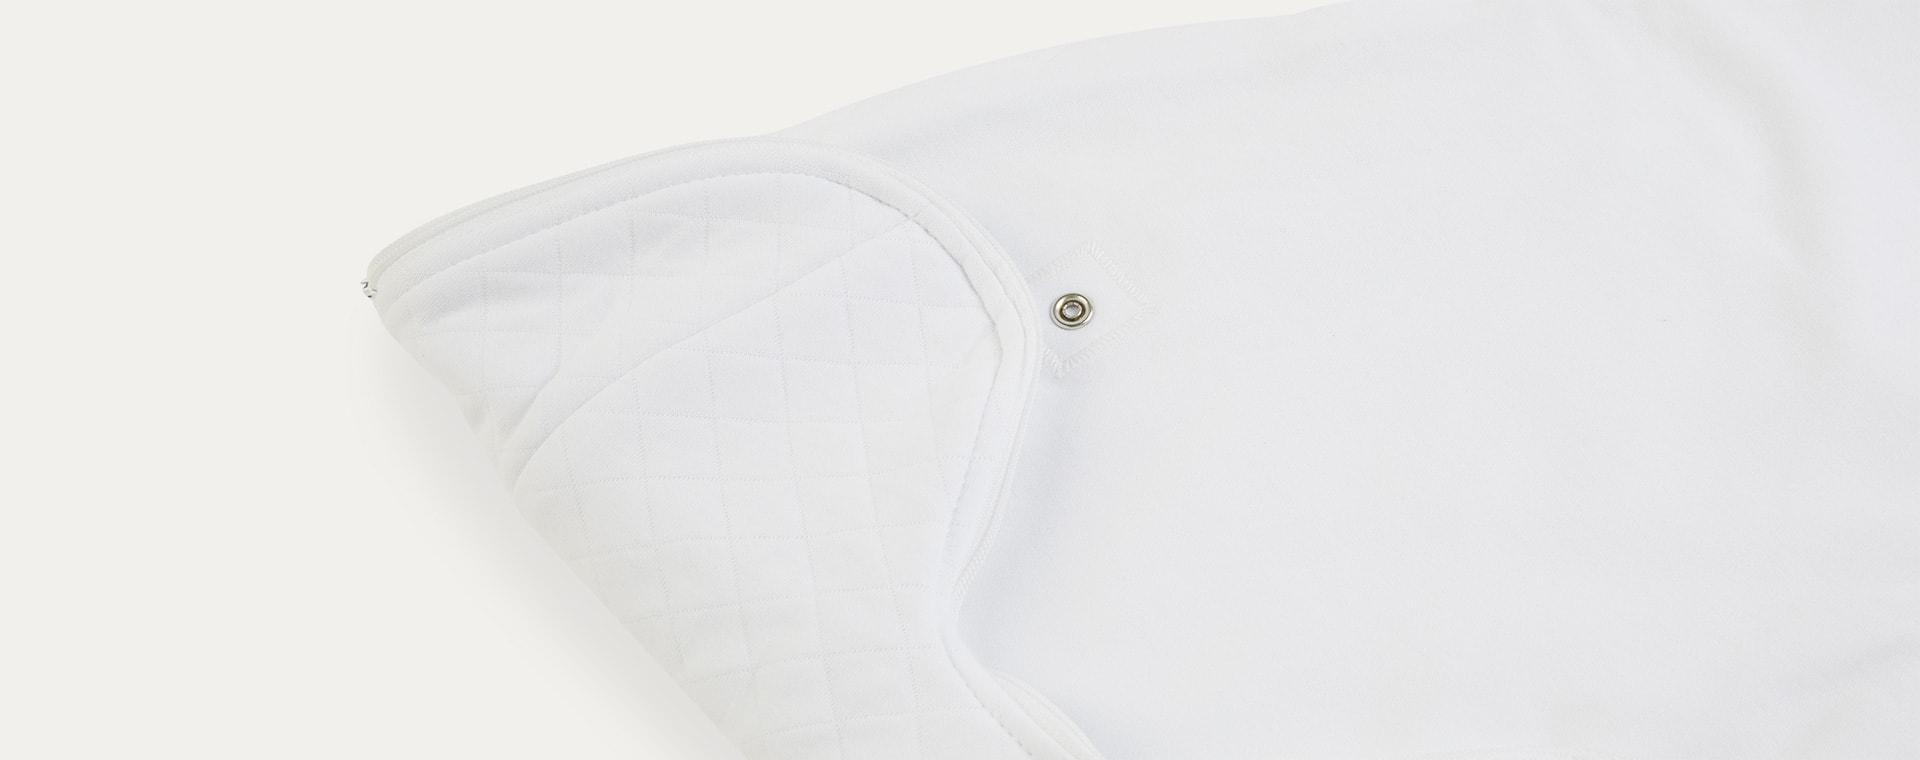 Soft White PurFlo Swaddle to Sleep Bag All Seasons 2.5 Tog